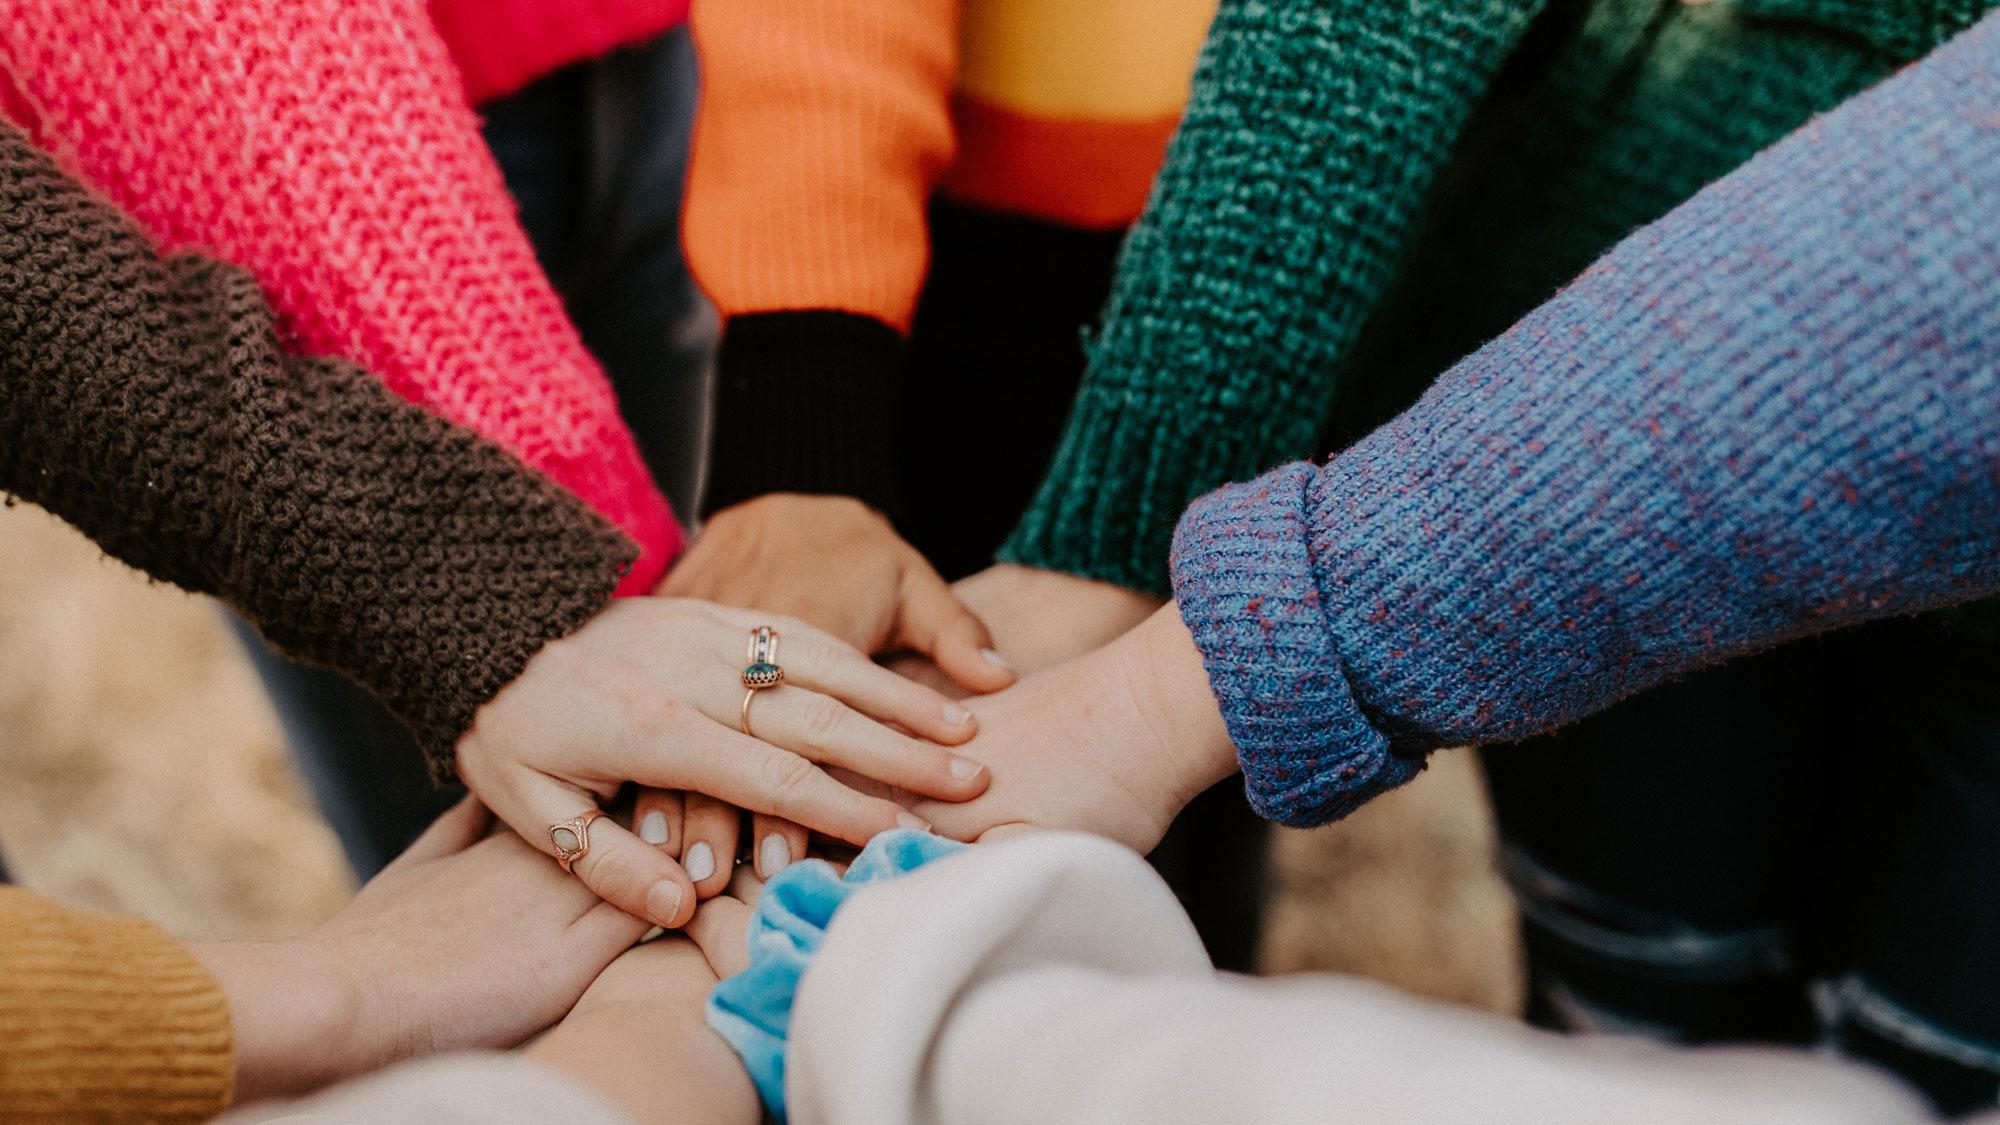 women's diverse hands